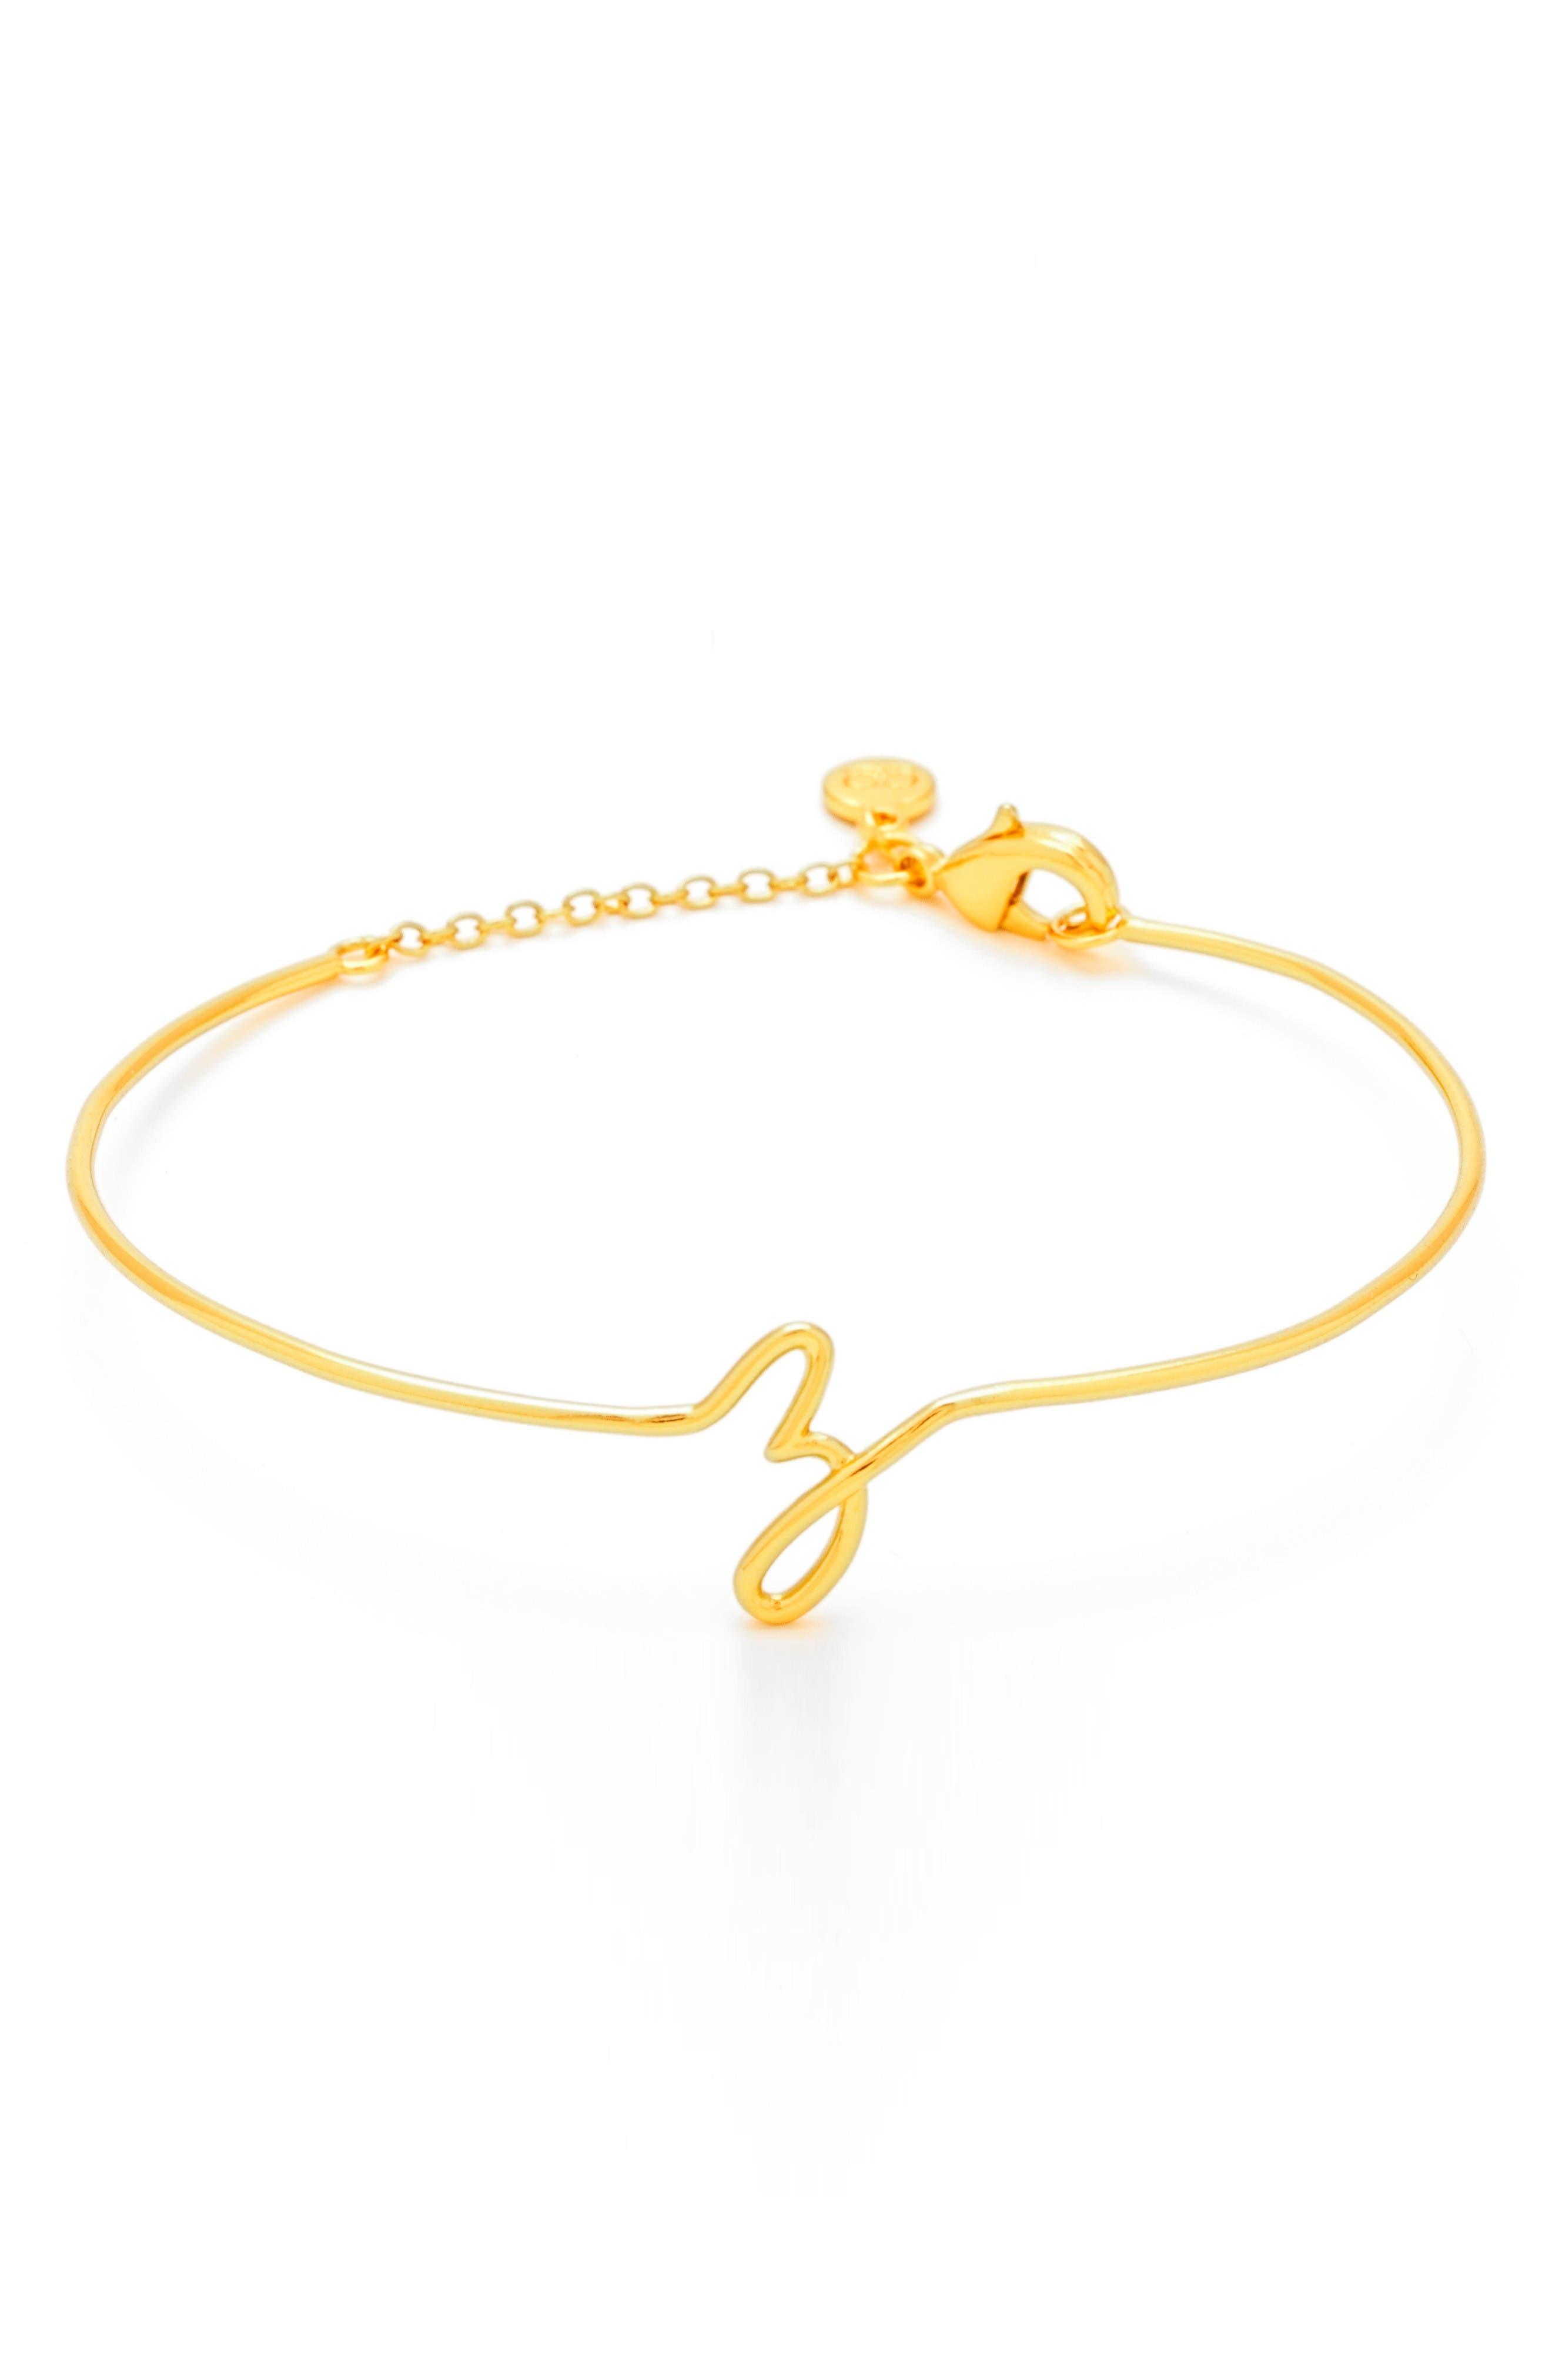 Main Image - gorjana Alphabet Bracelet